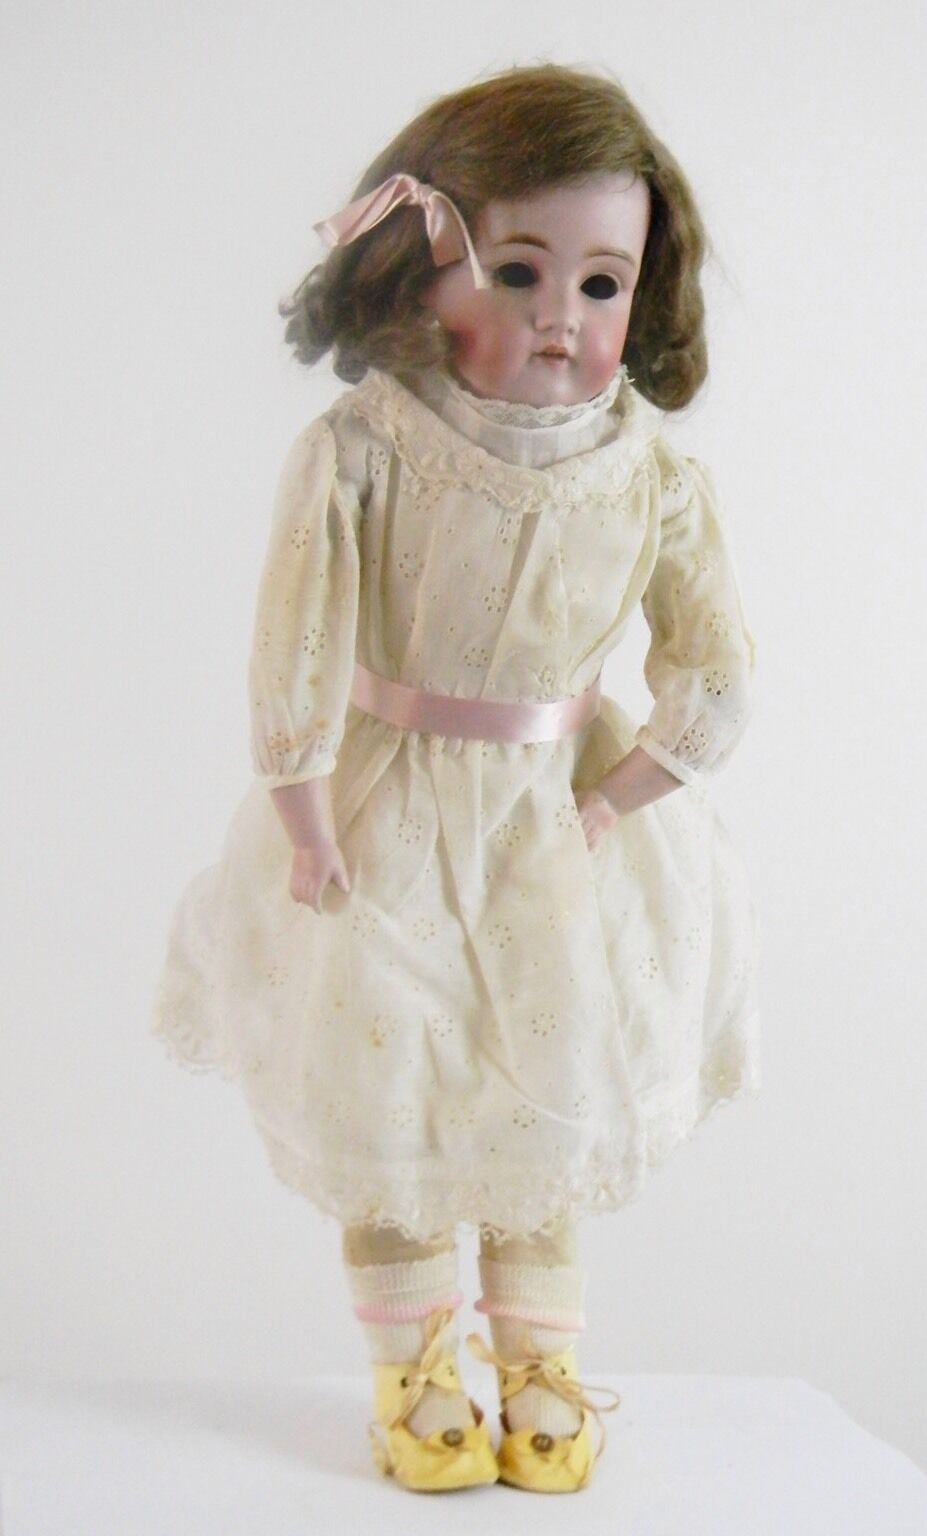 19thC Rare Cork Stuffed JDK Dep 10 154 Kestner Bisque Head Antique 23 Doll